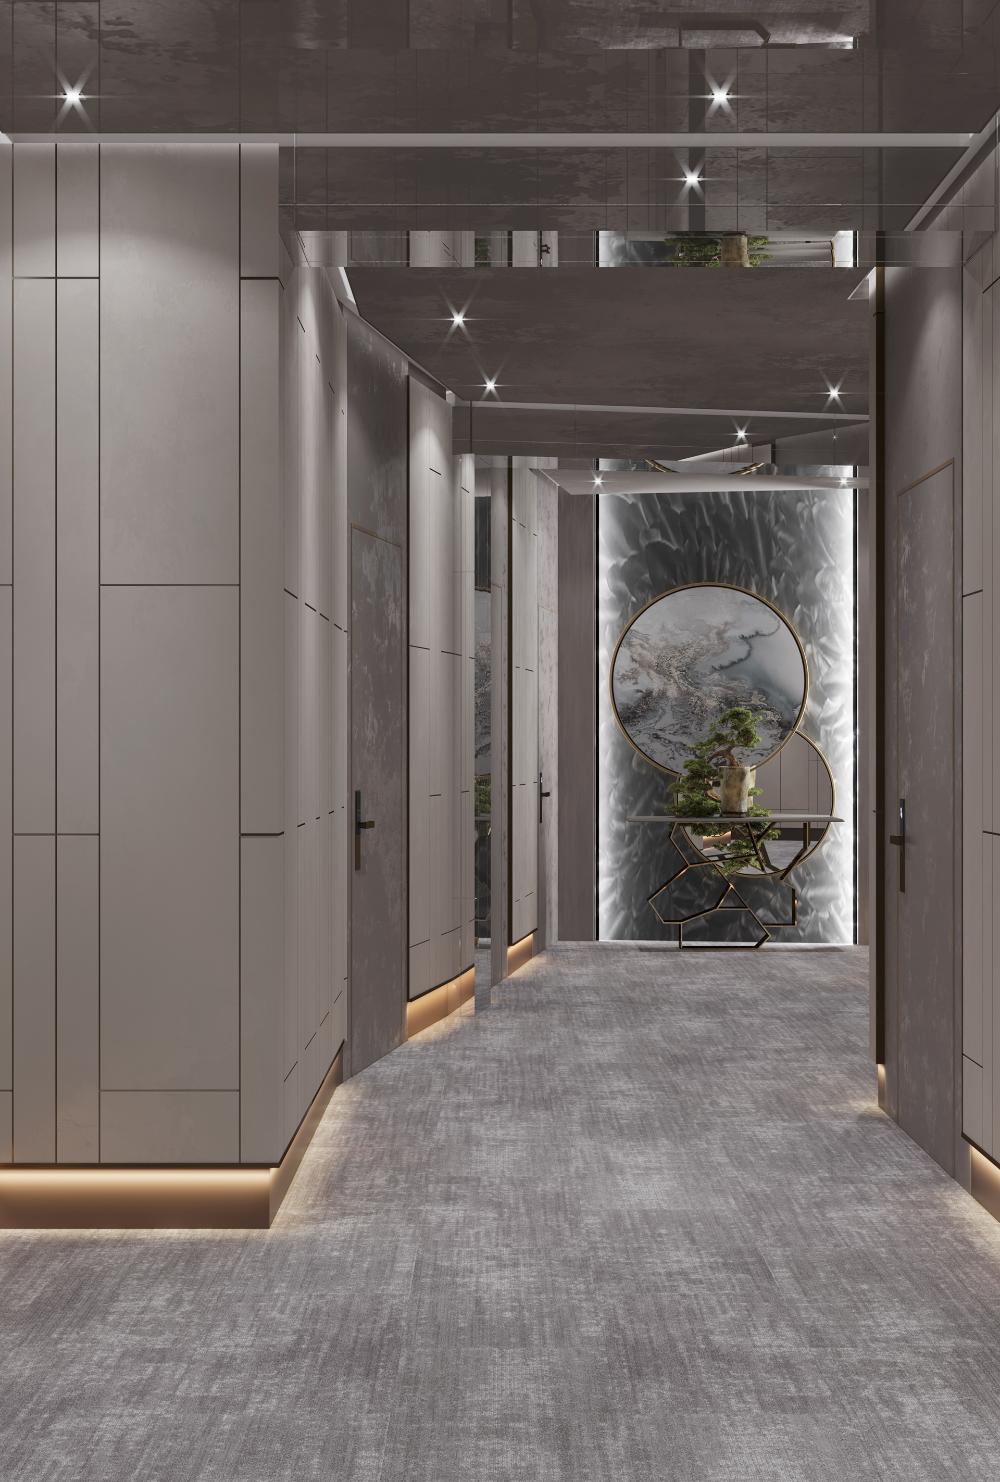 Pilot Hotel Hallway Baku Azerbaijan On Behance Hotel Room Design Bedrooms Hotel Hallway Luxury Houses Entrance